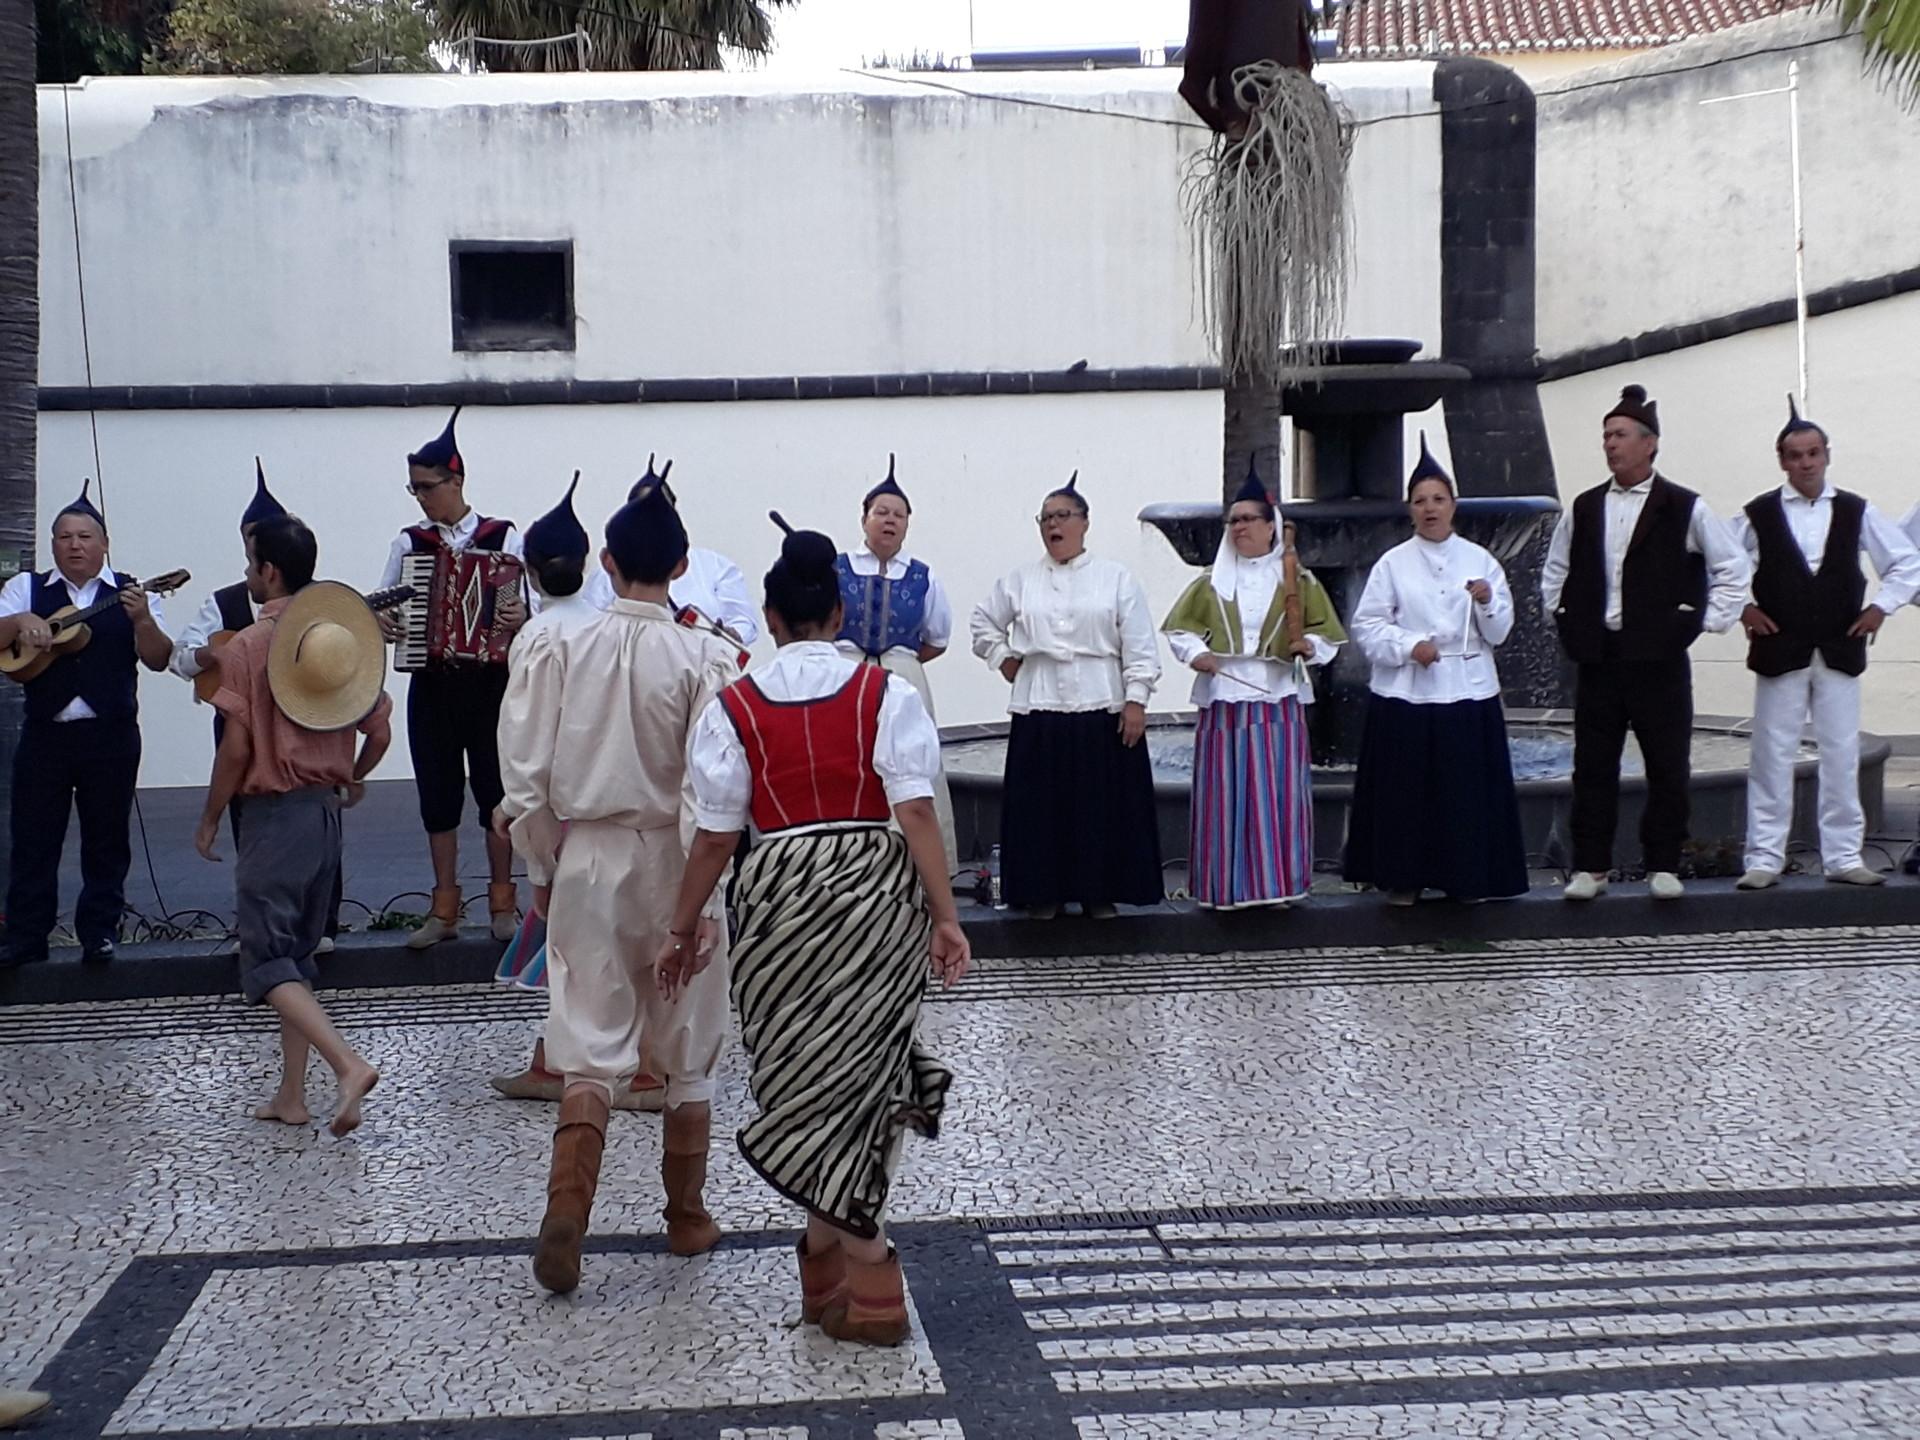 live-music-madeira-kinds-culture-7d2cec6